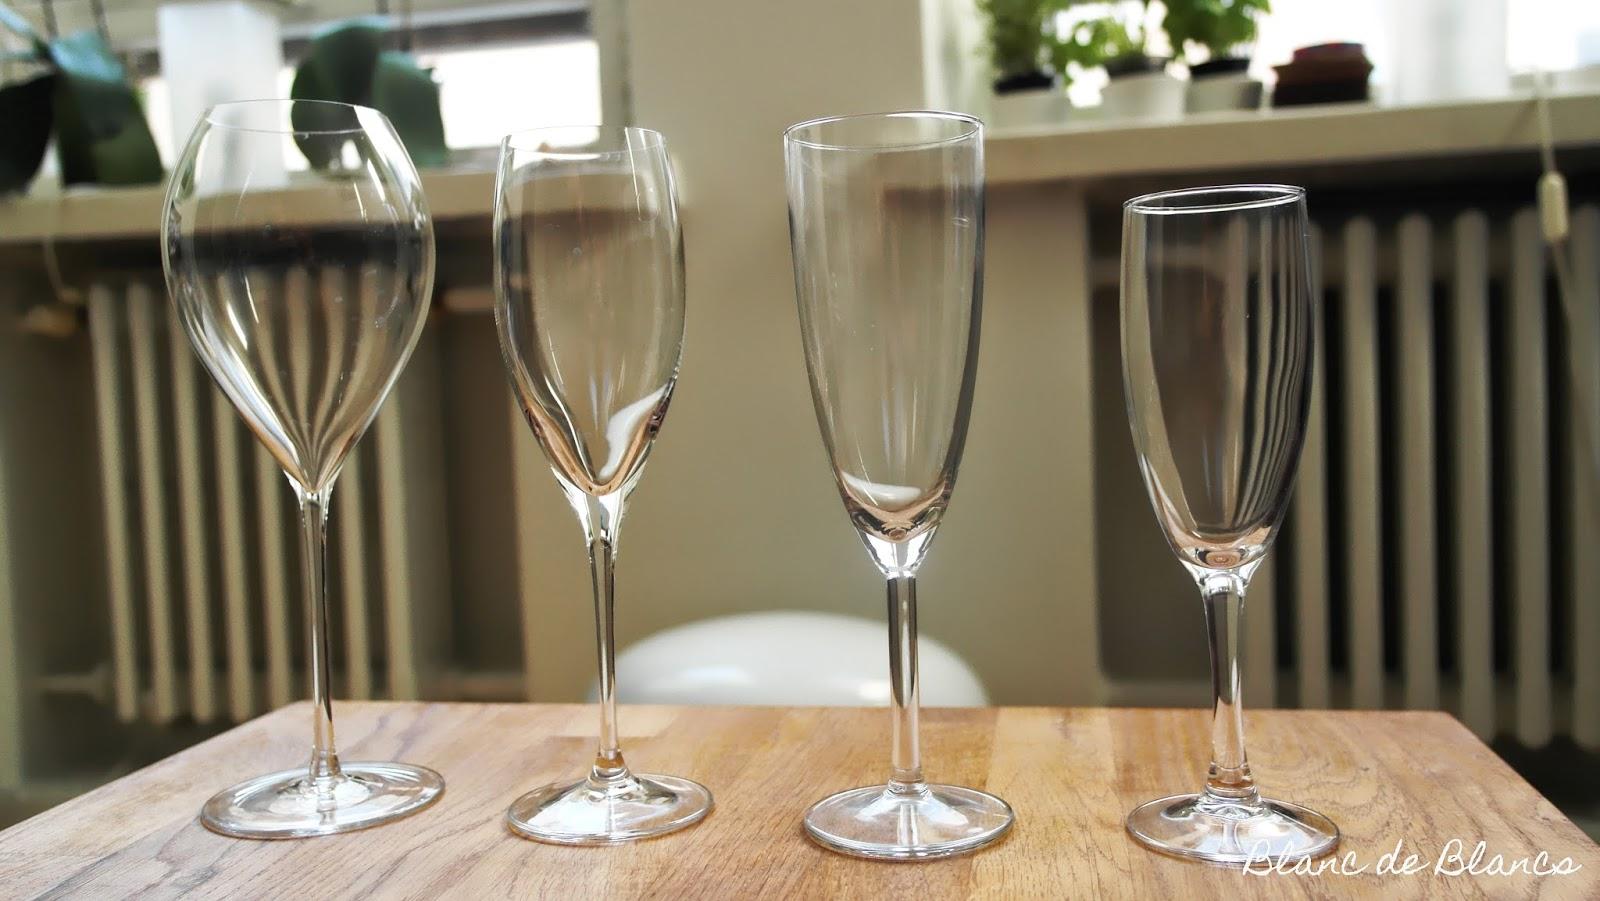 Erilaisia samppanjalaseja - www.blancdeblancs.fi